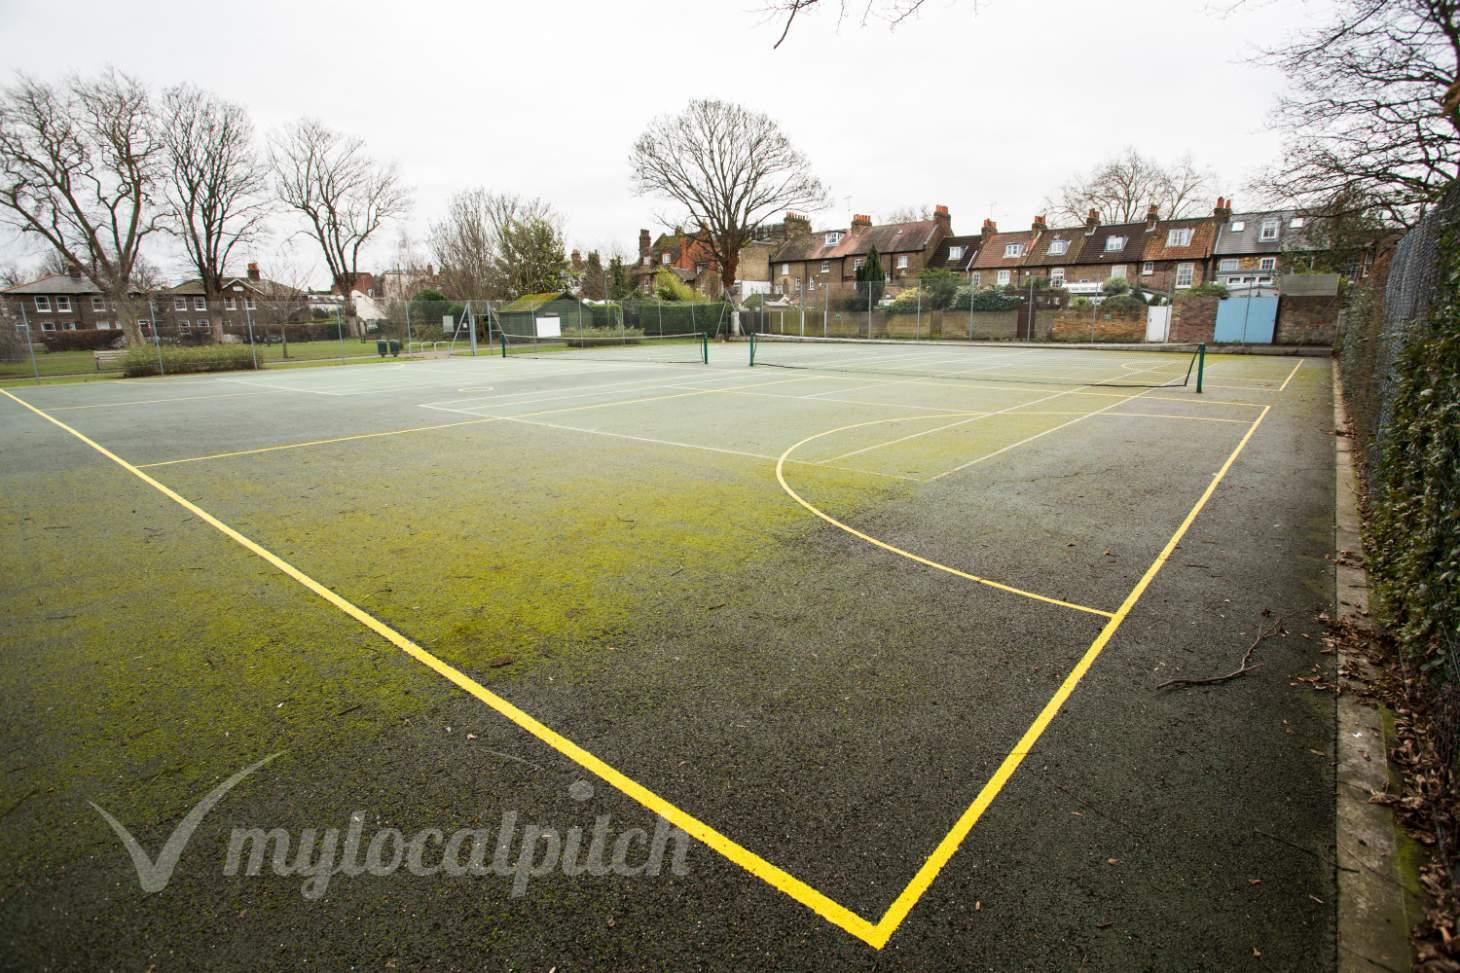 Westerley Ware Outdoor   Hard (macadam) netball court